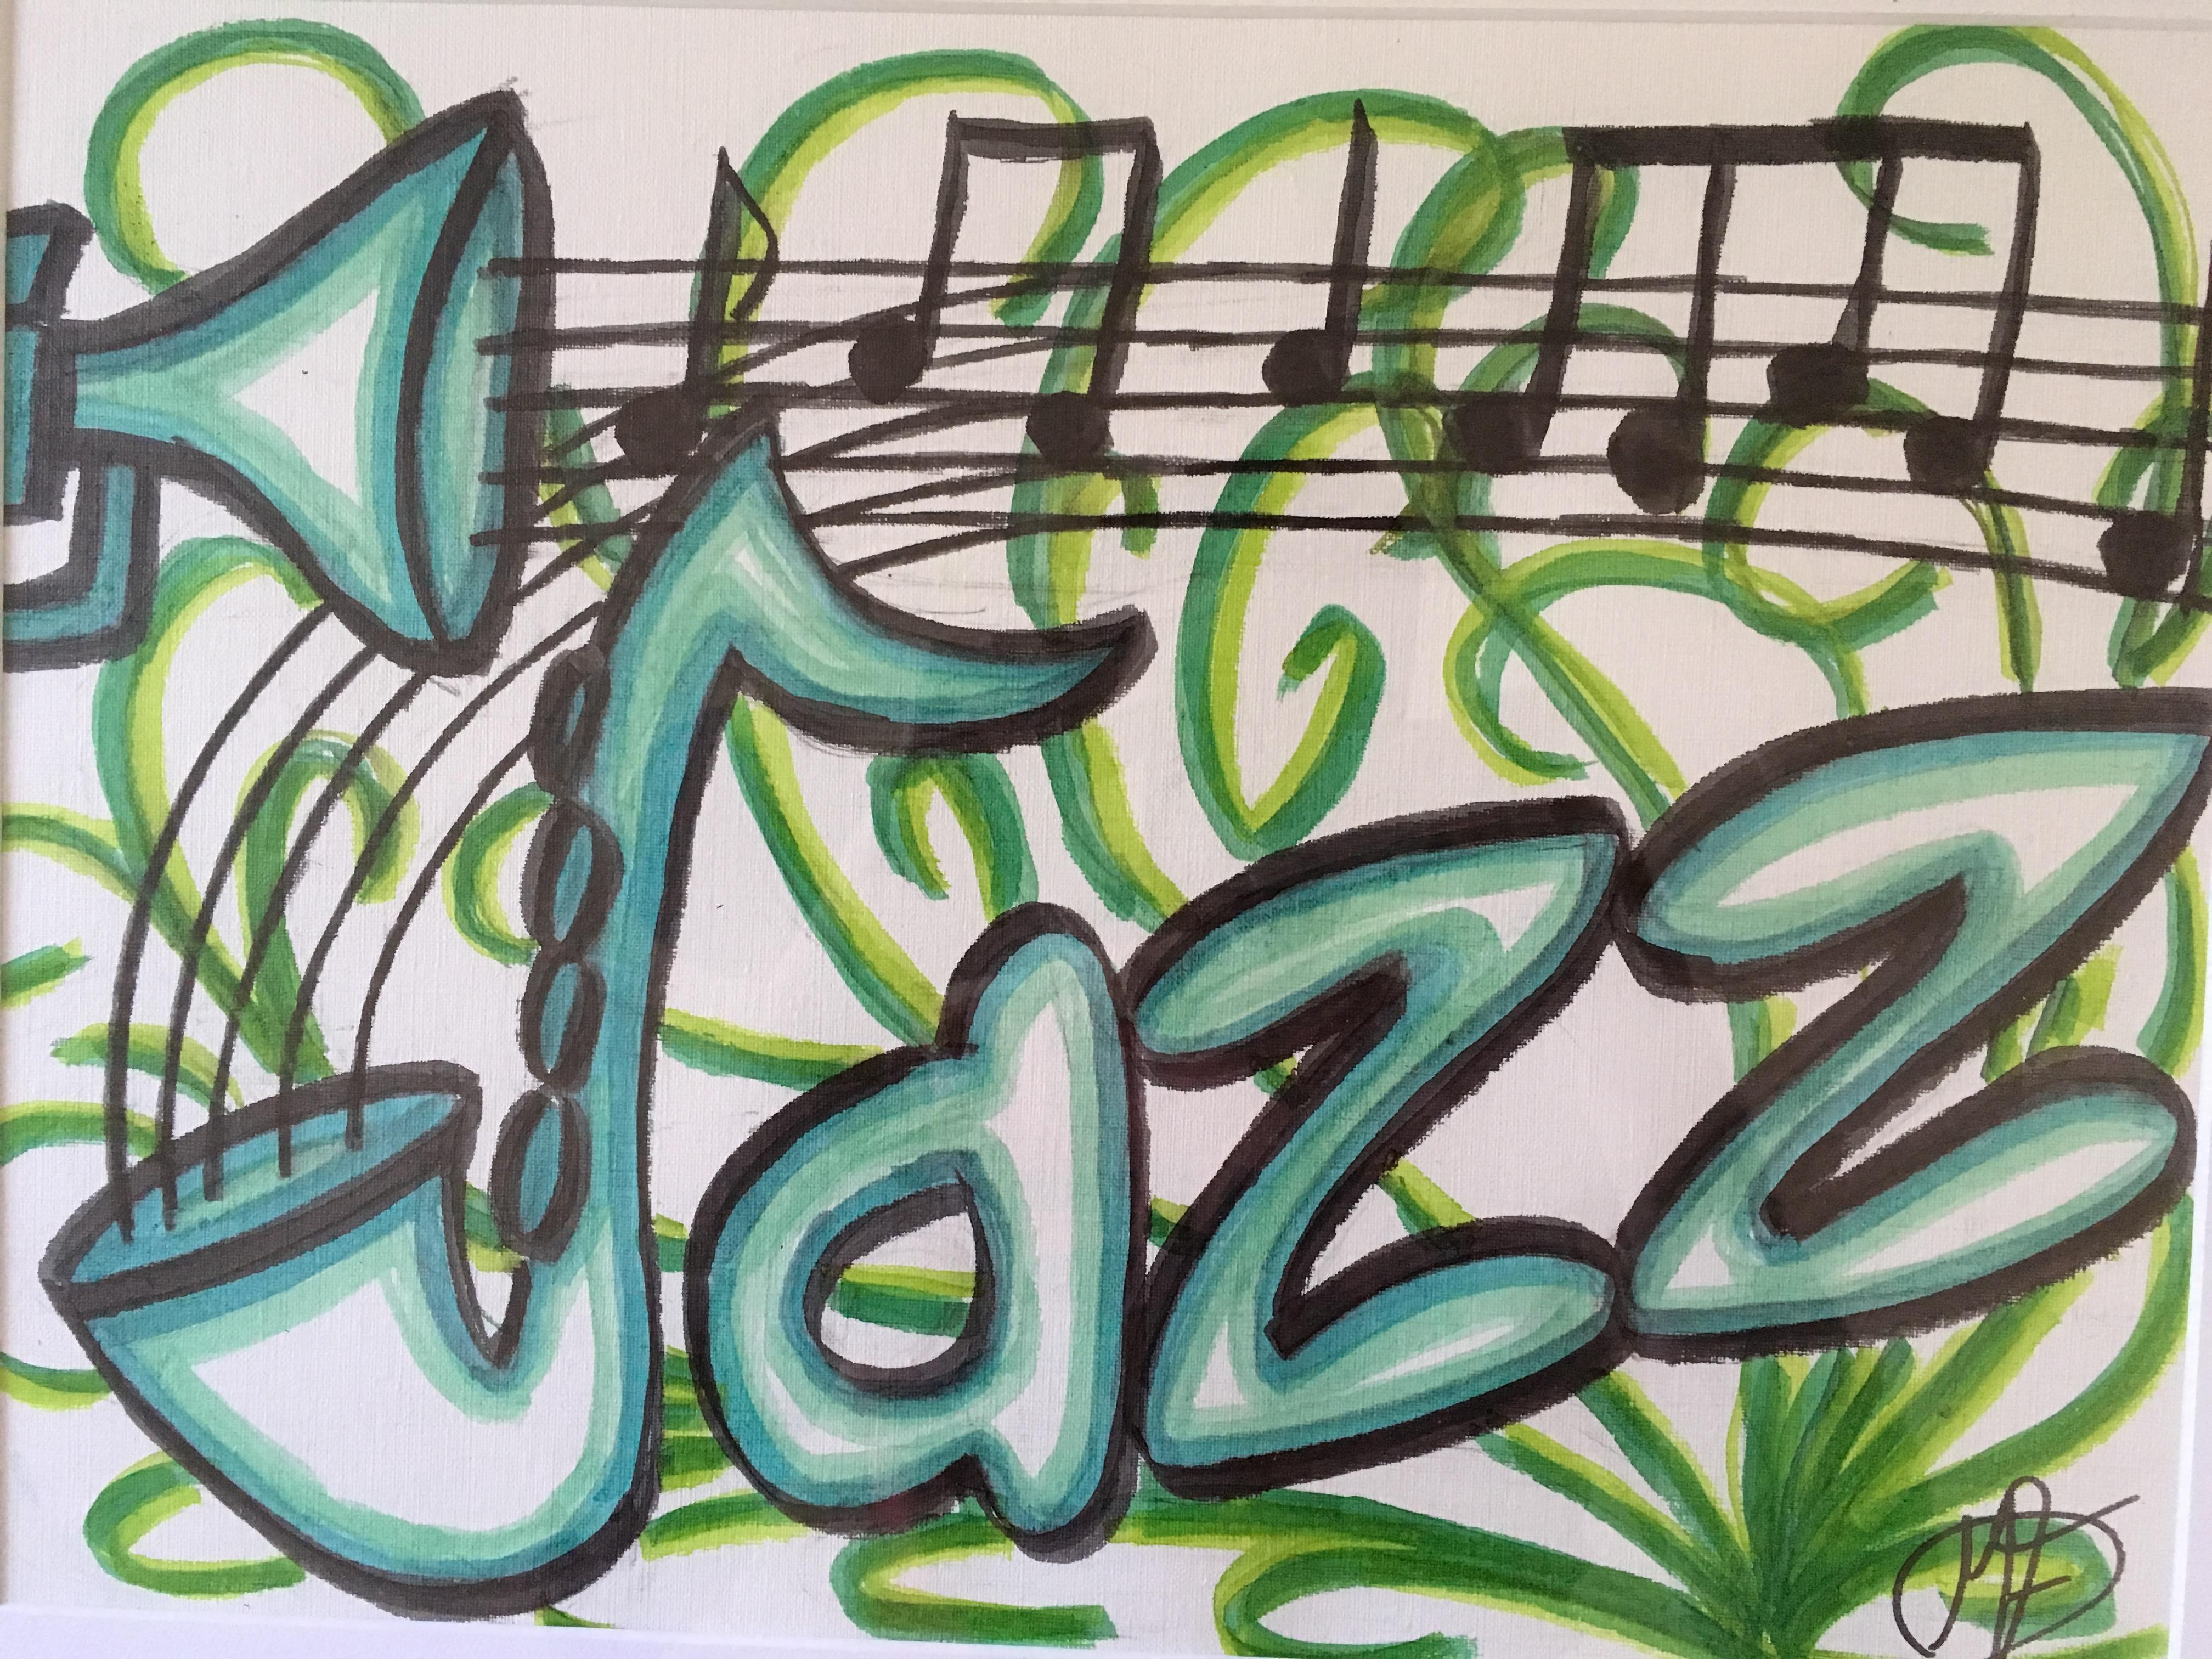 Jazz / Projet P03 - Les dessins - Mister Fanjo